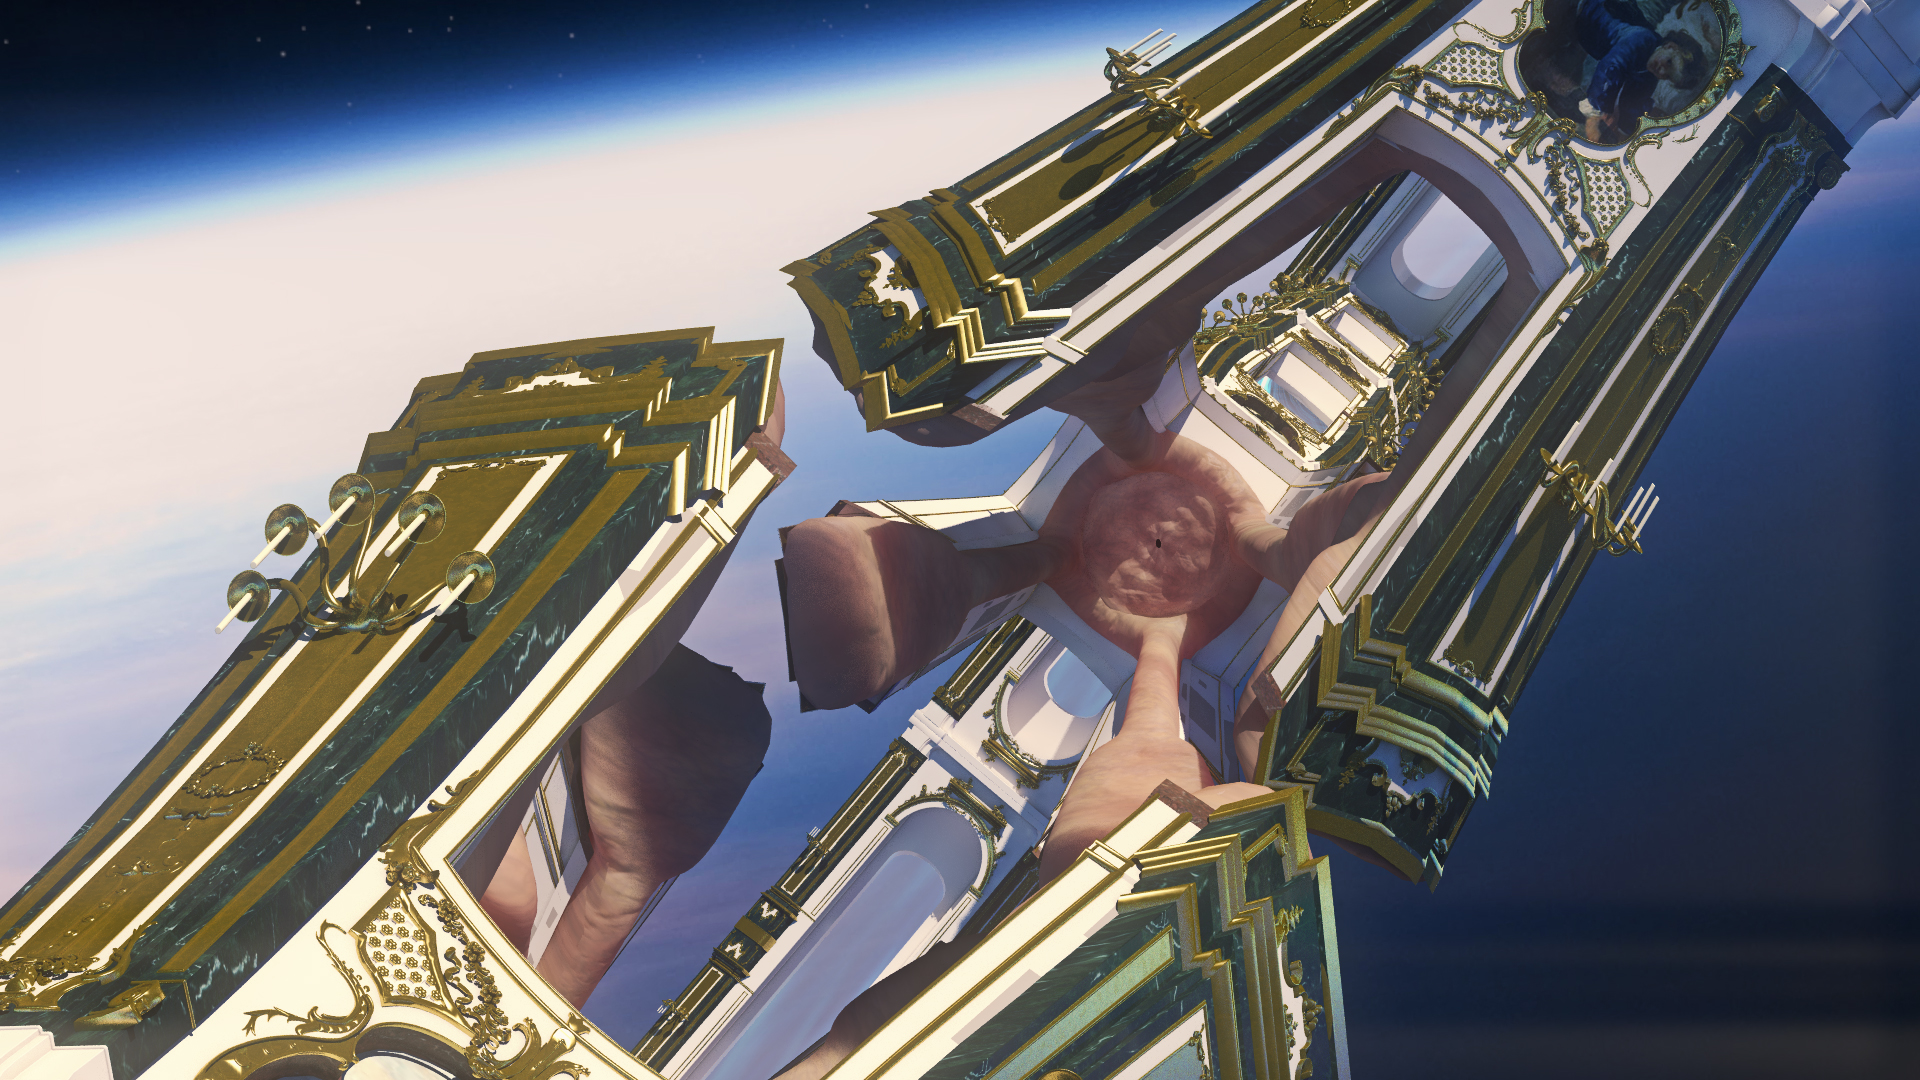 Jonathan Monaghan  Alien Fanfare ,2014 CGI animated HD film, 16 min loop, edition of 3 with laser-etched aluminum case, USB, Keidom ID  Music by Evan Samek & John Di Lasci